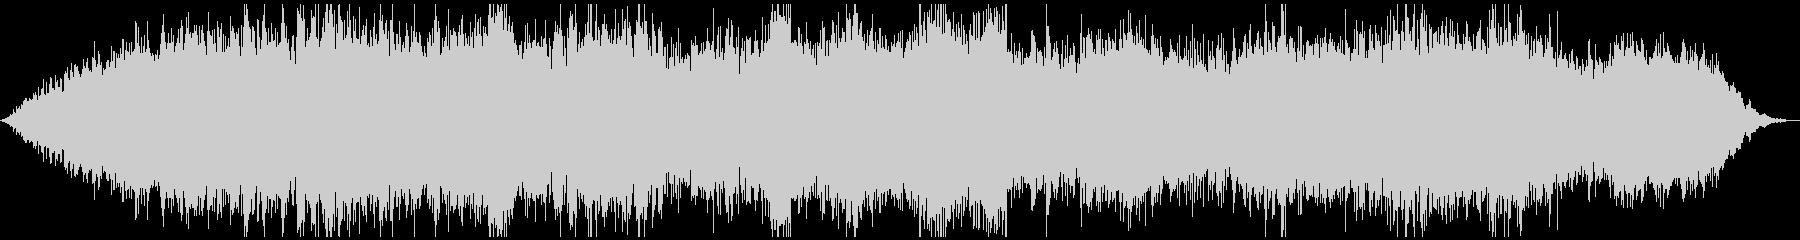 PADS ホラーストリングス01の未再生の波形